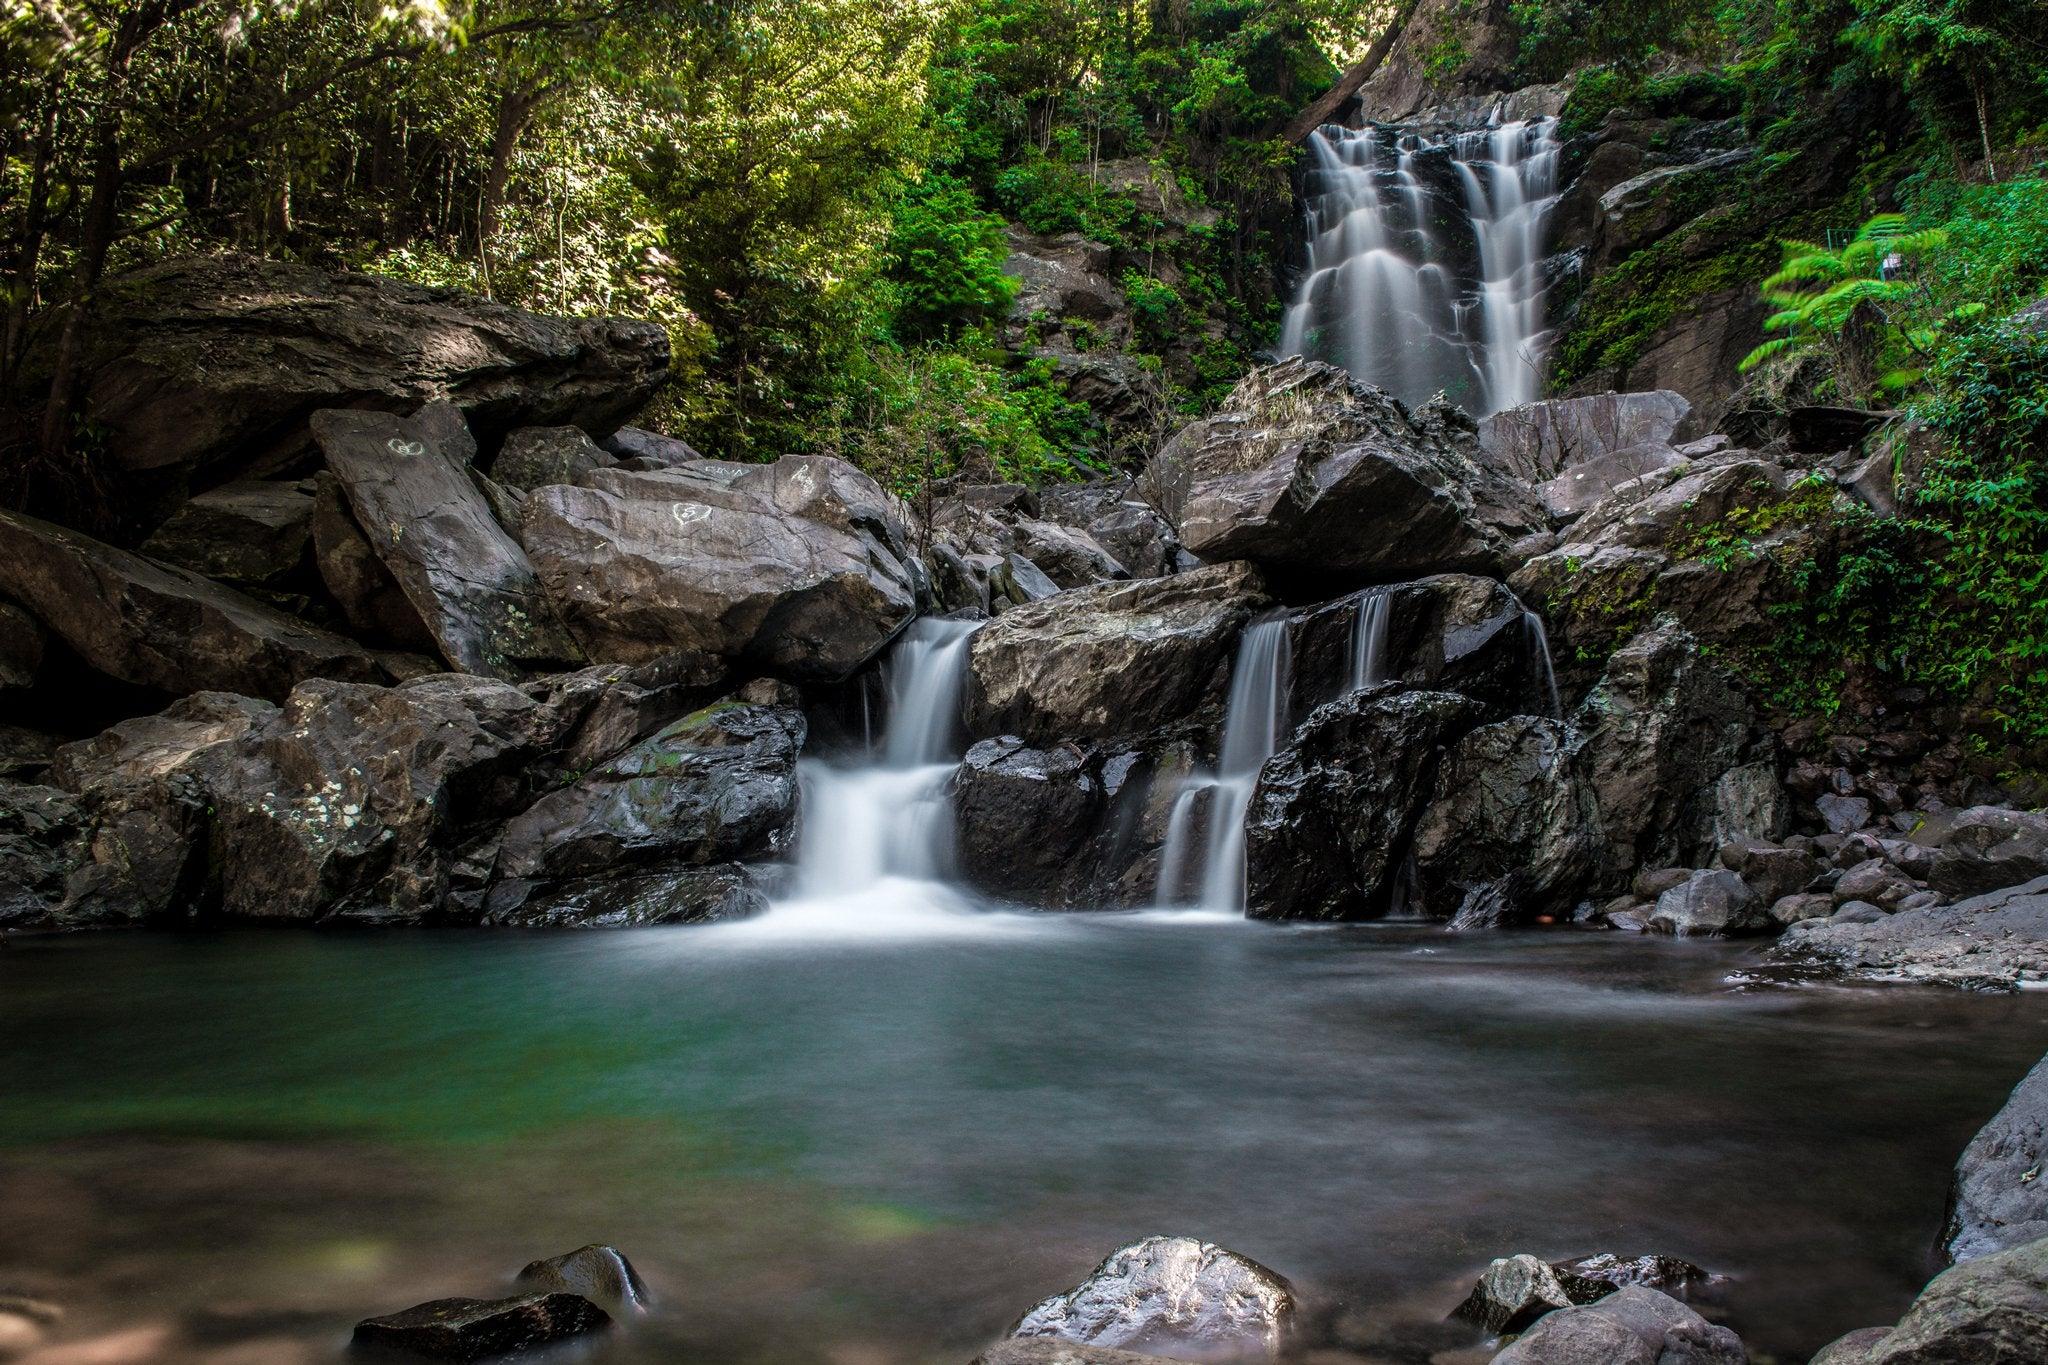 Hanumana Gundi Falls - Amazing Places To Visit In Chikmagalur